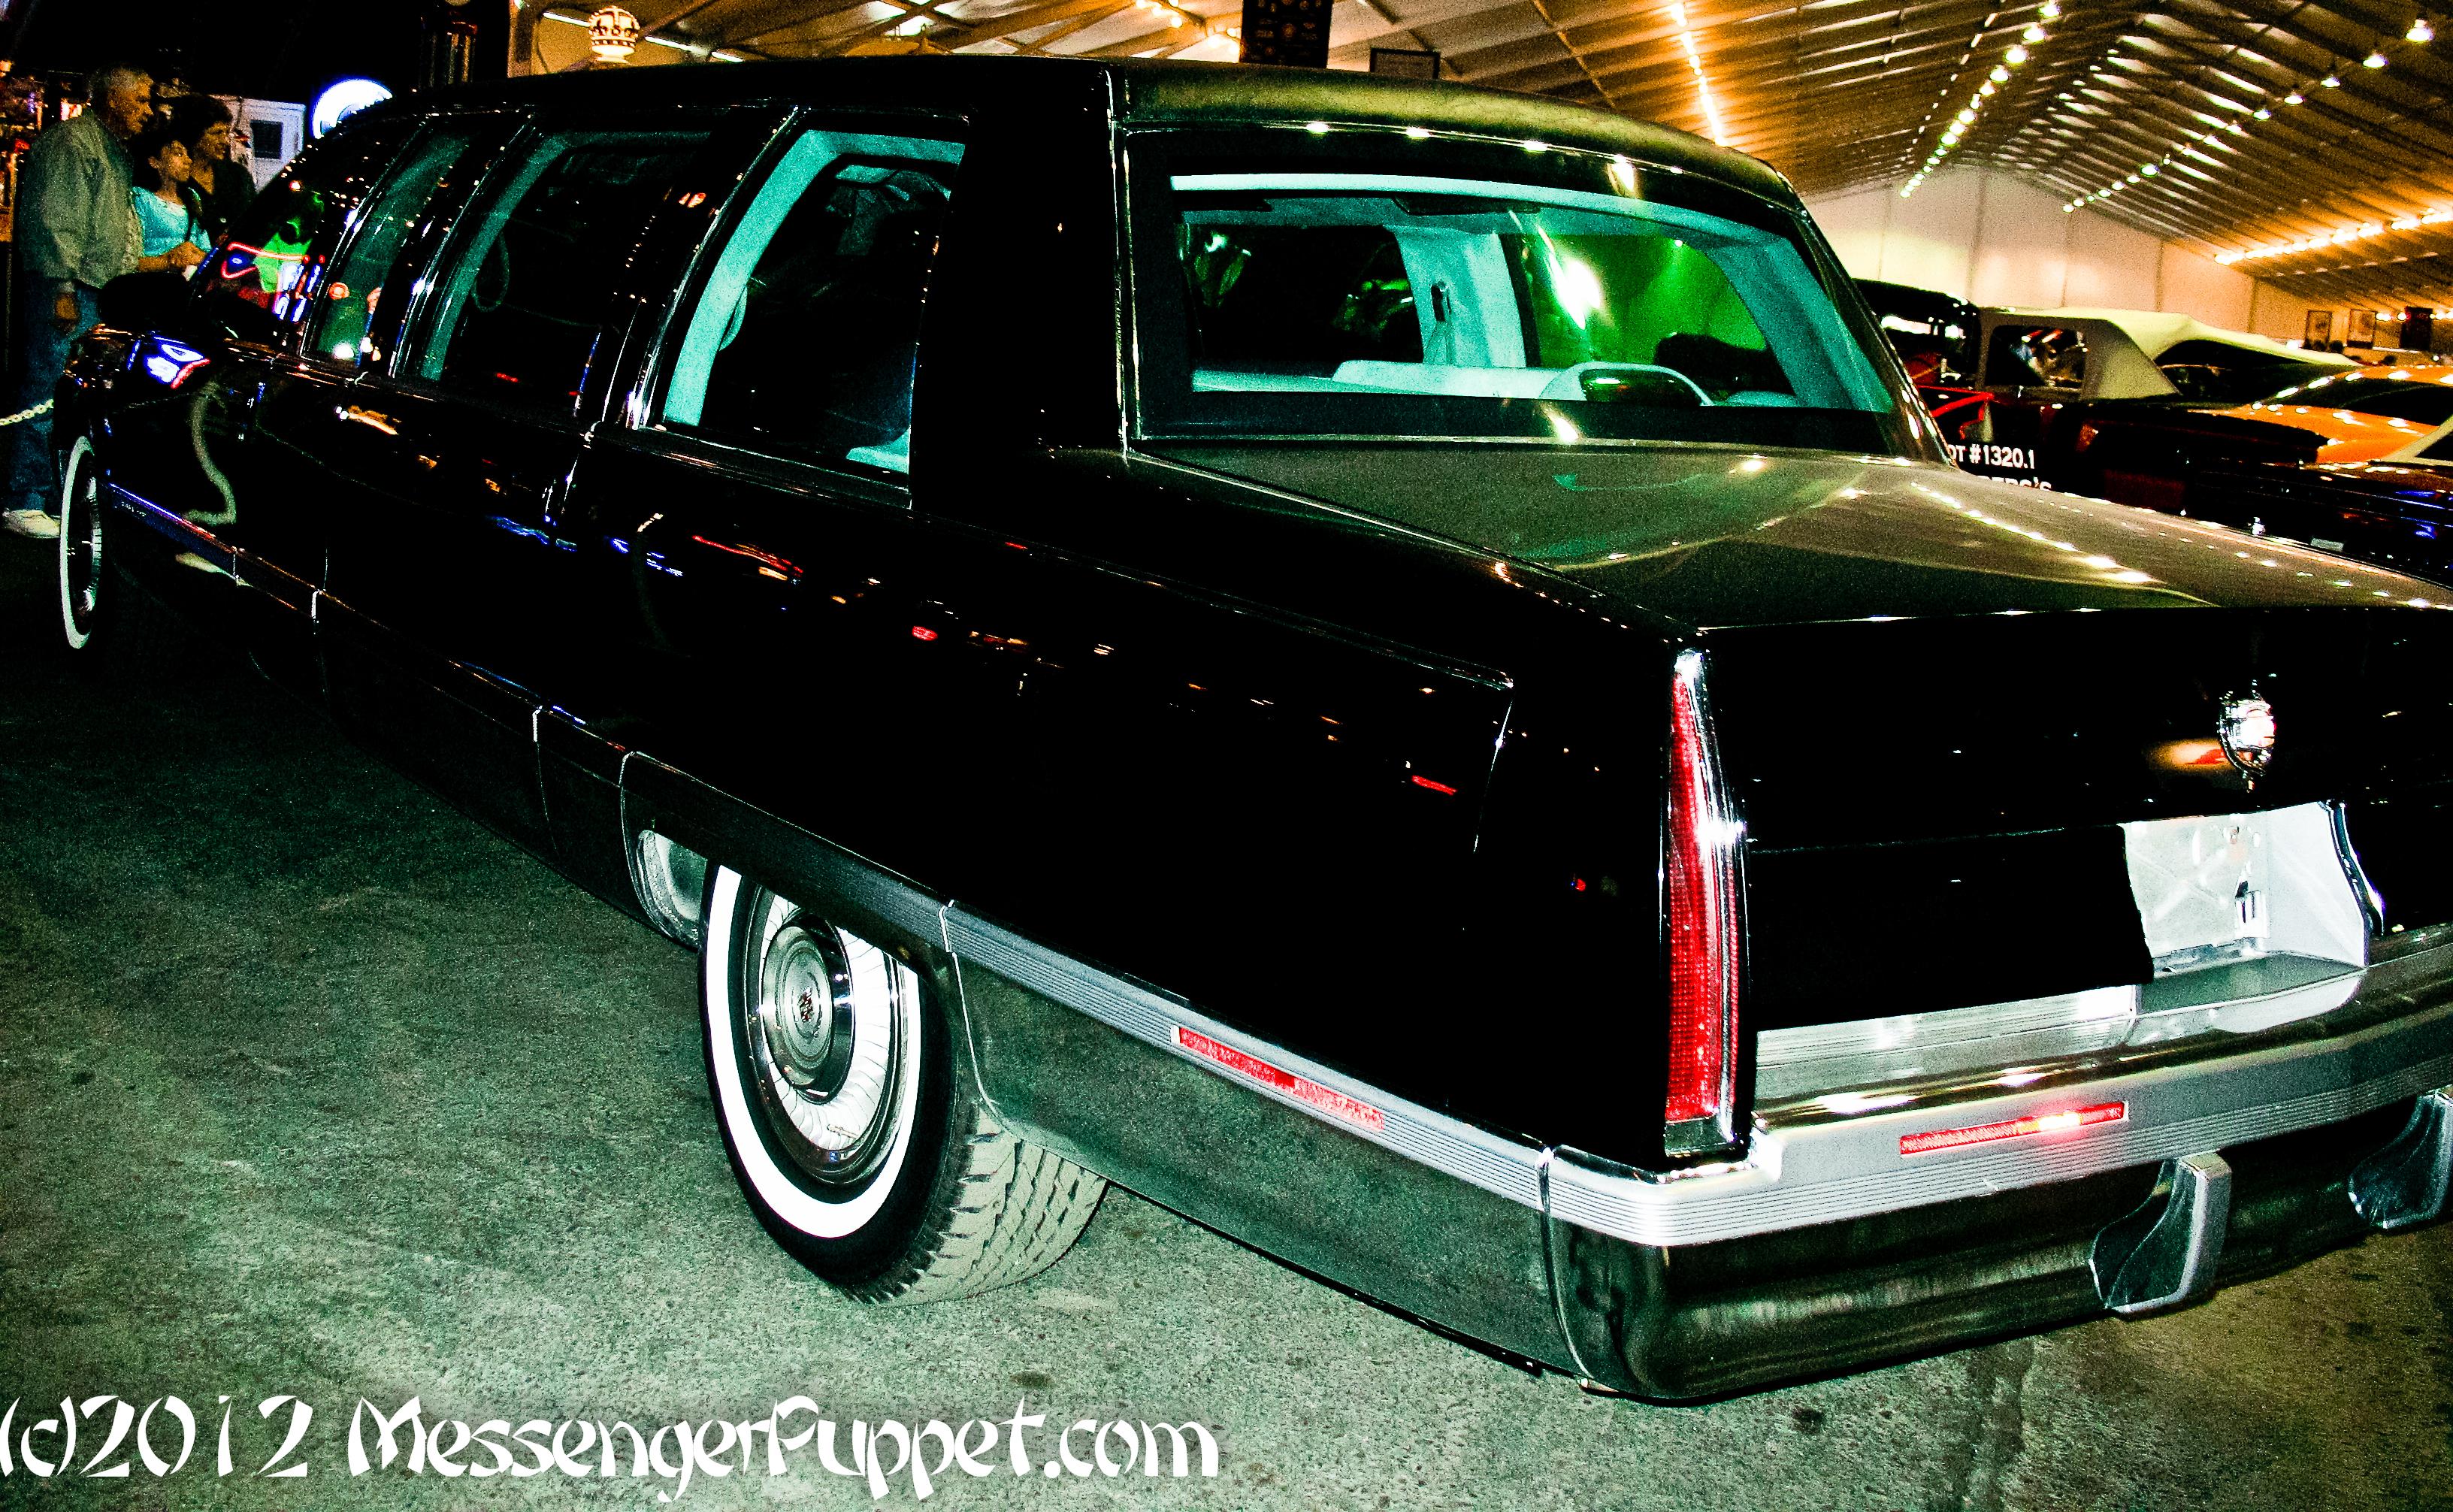 Cadillac Presidential Limo rear